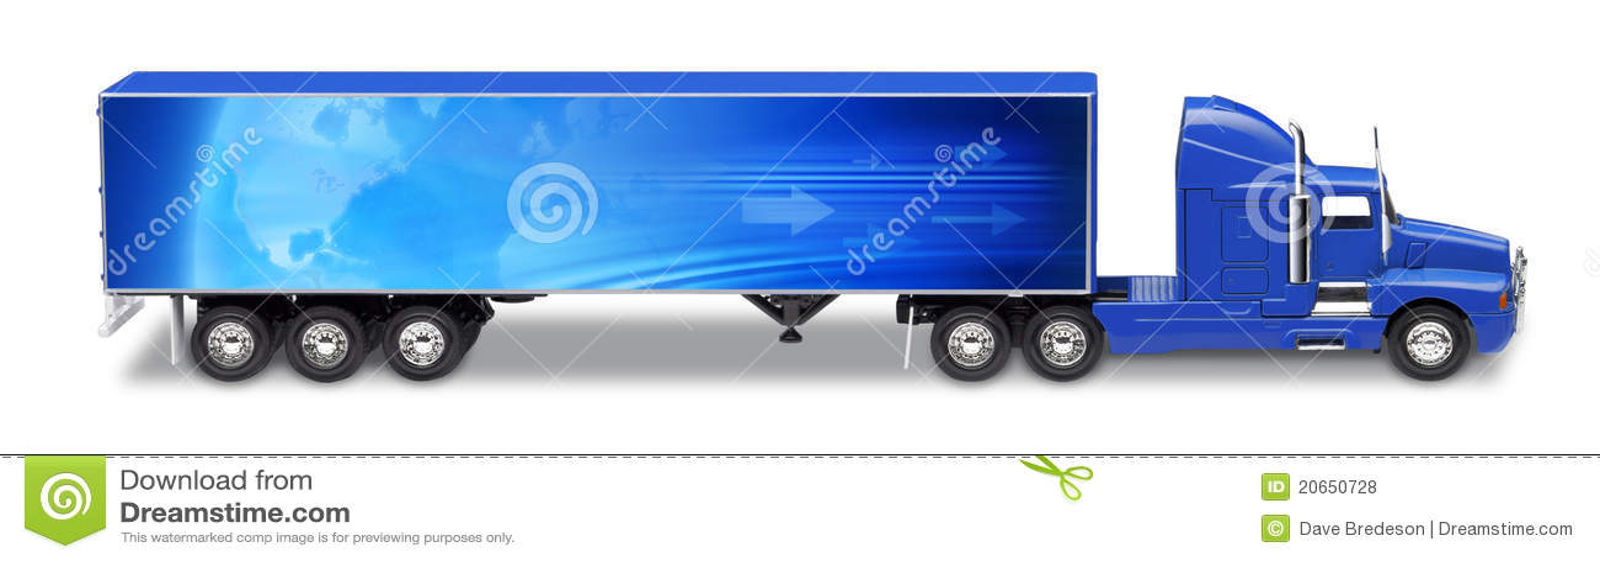 camion de semi remorque de transport photo stock image 20650728. Black Bedroom Furniture Sets. Home Design Ideas